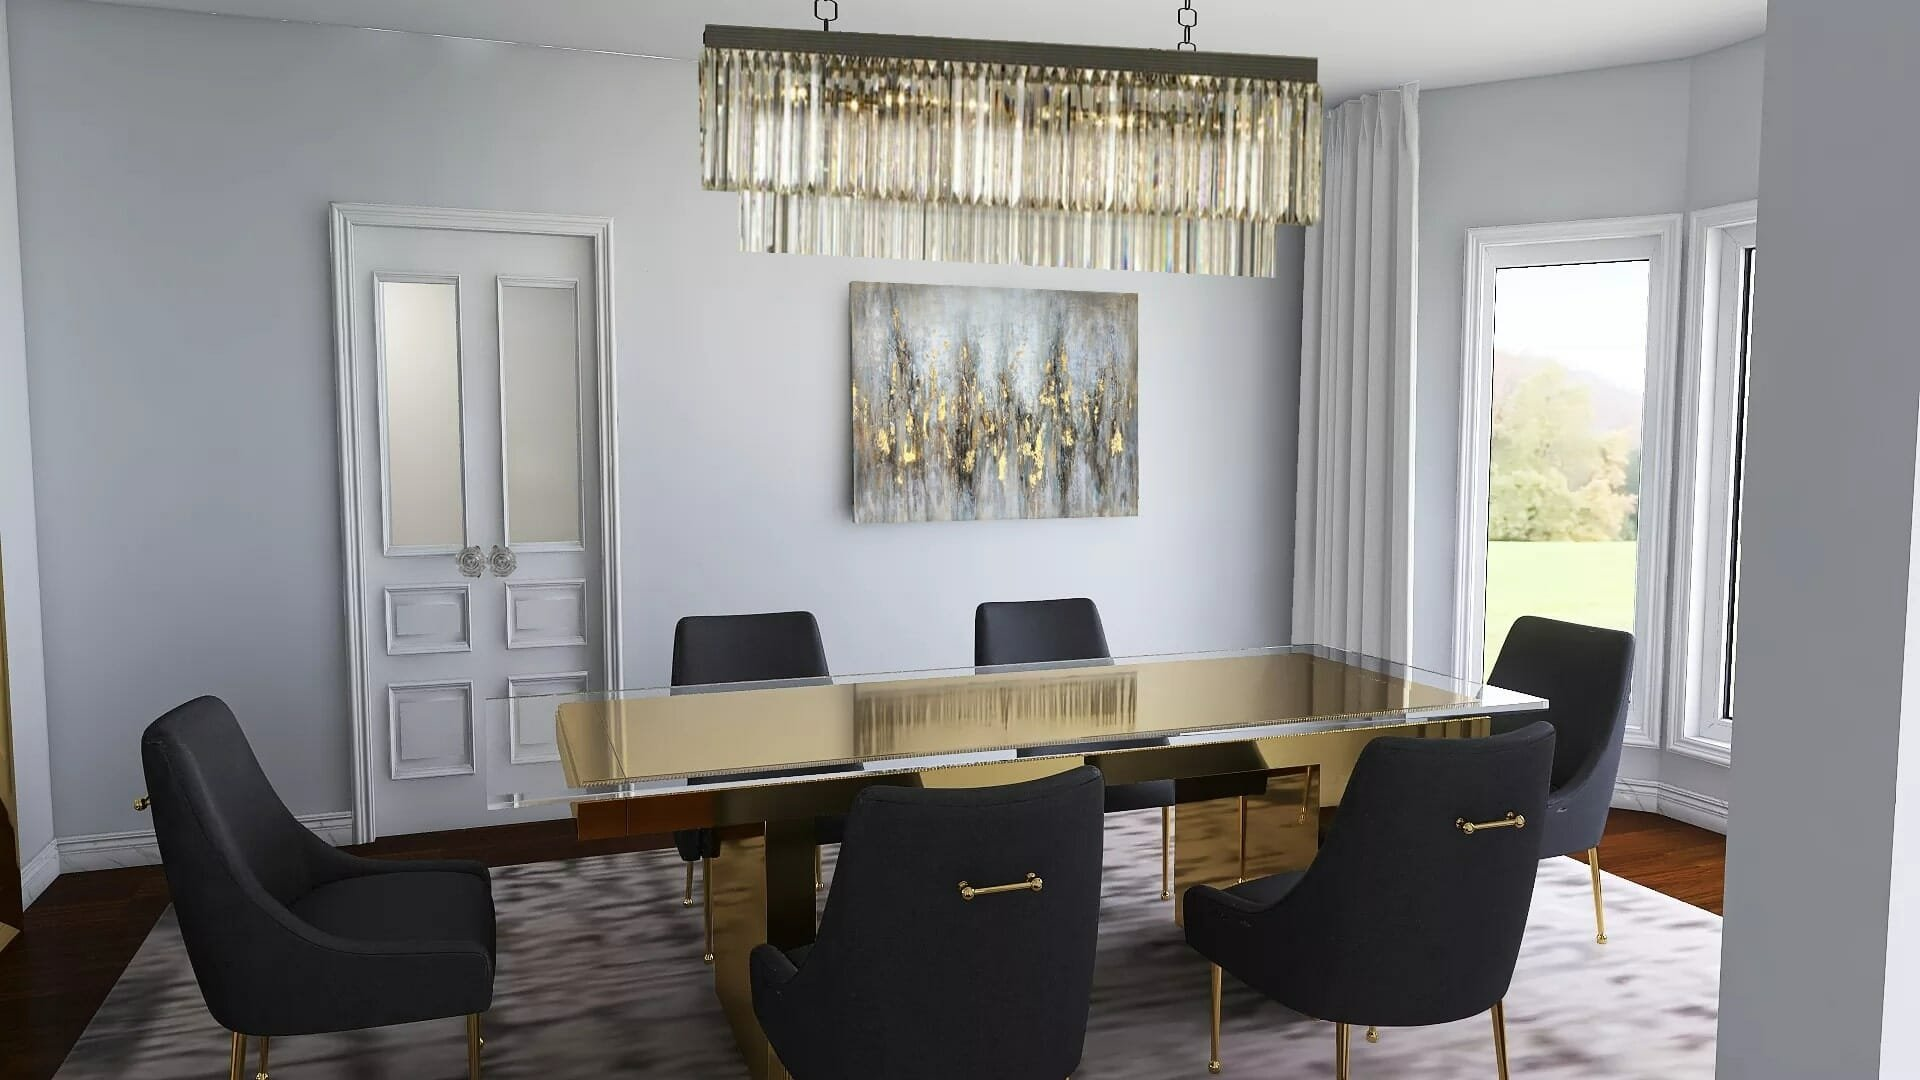 Glamorous dining room by top houzz interior designer memphis tn